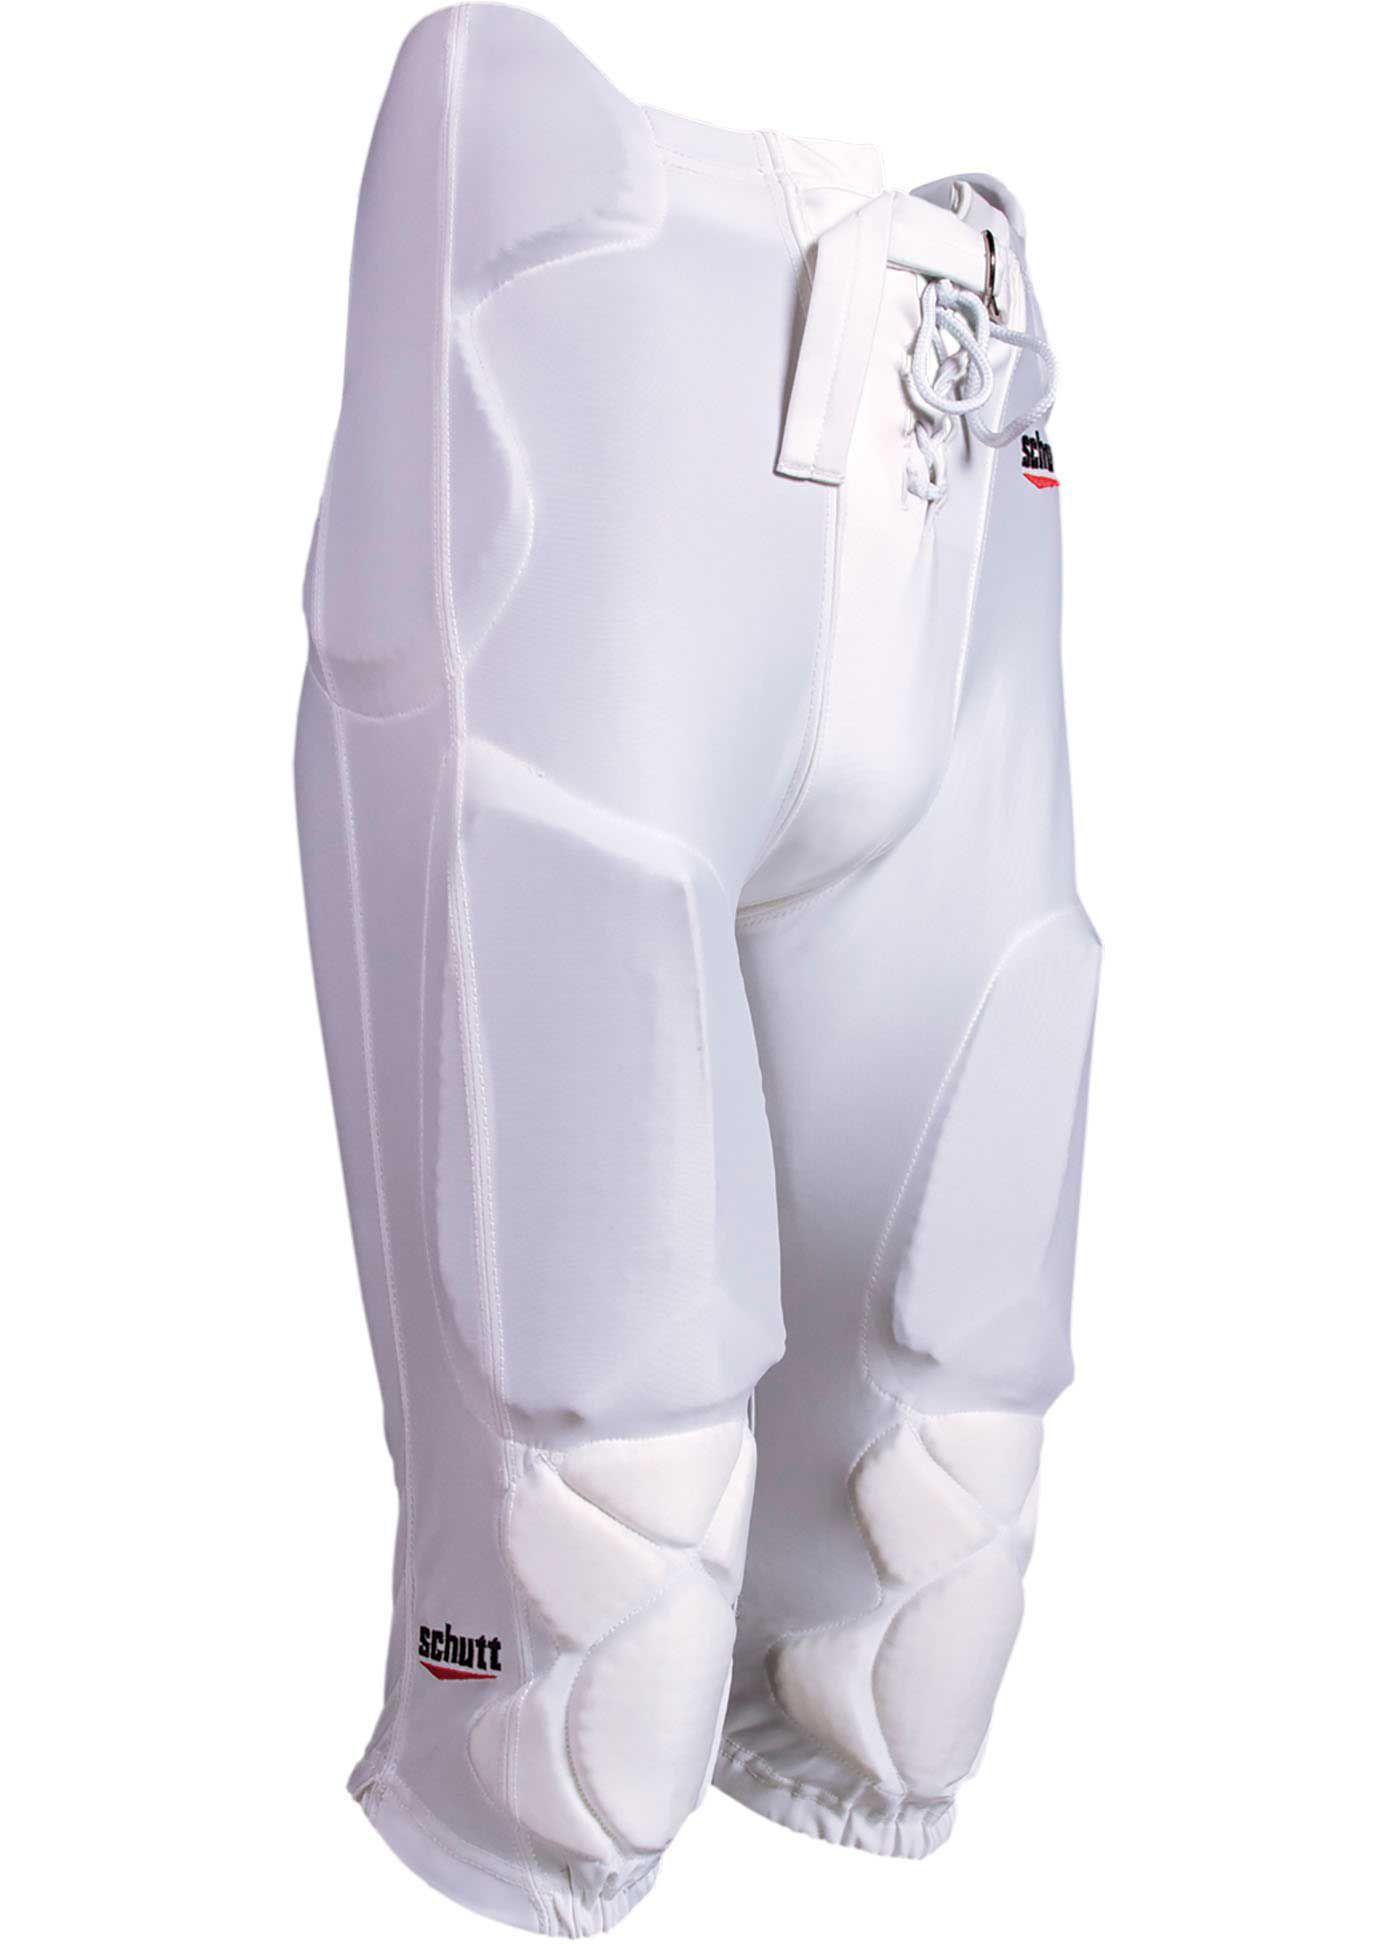 Schutt Varsity DNA All-In-One Pants